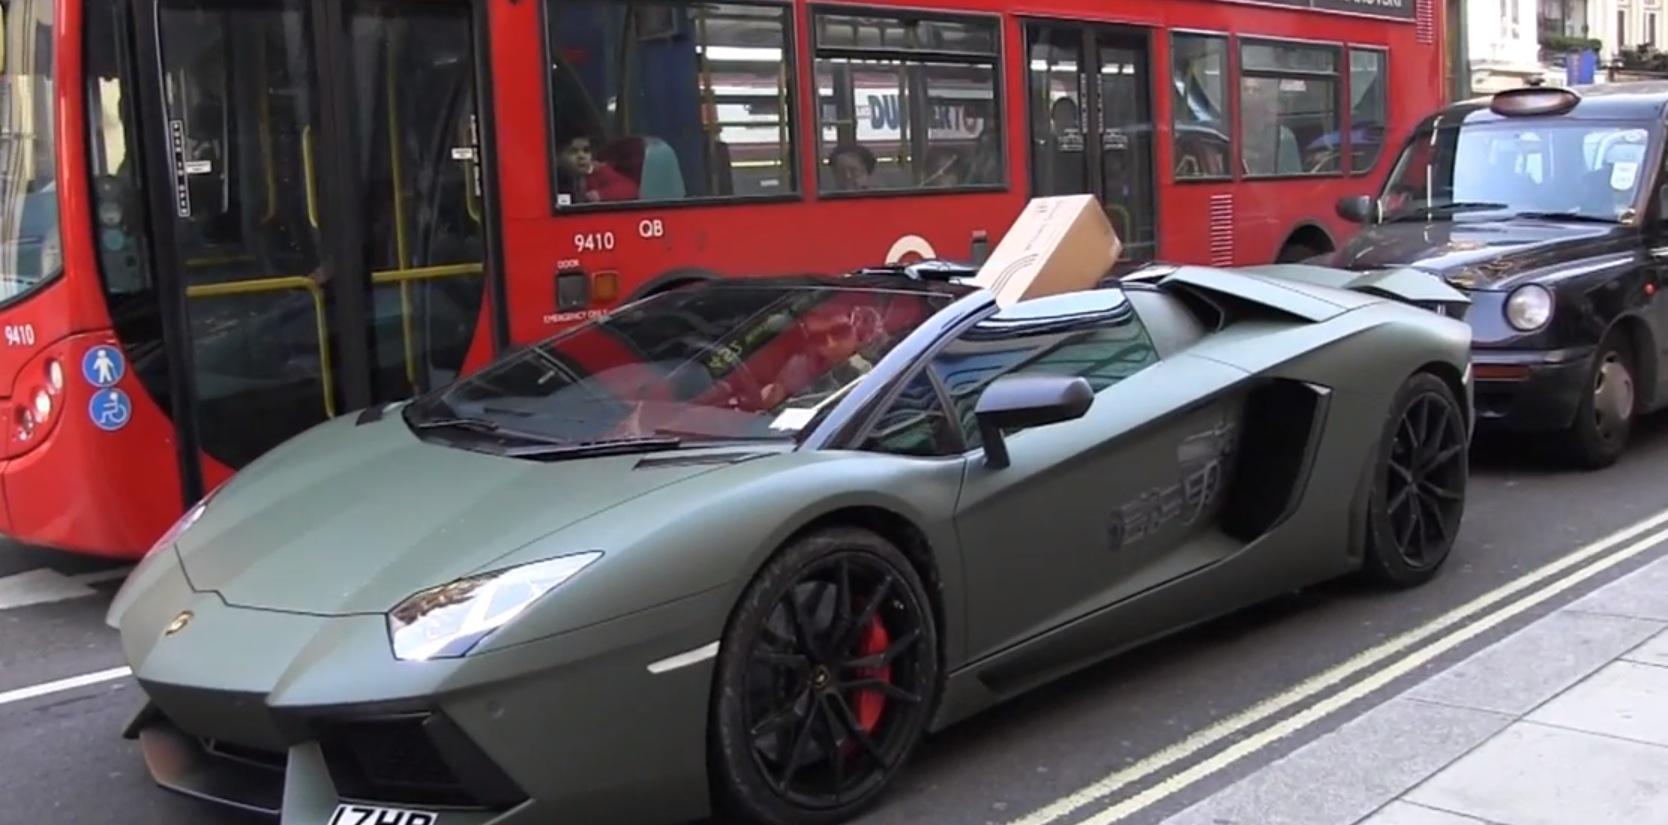 Lamborghini Aventador Roadster Hauling Christmas Presents